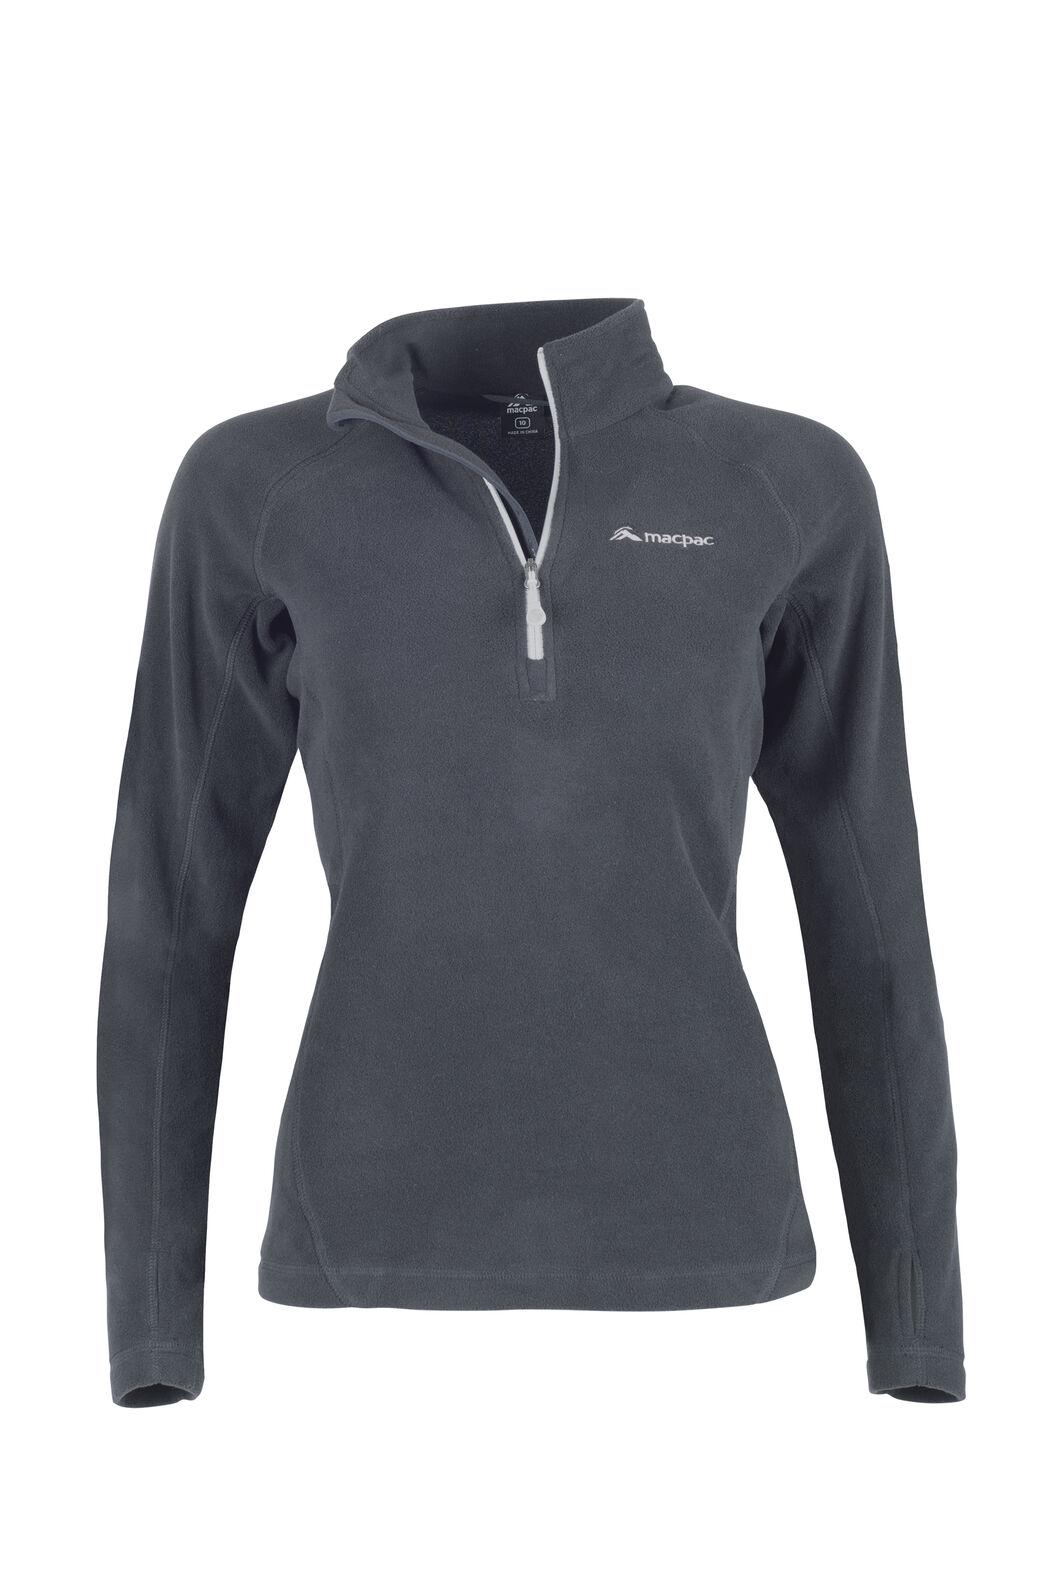 Macpac Tui Polartec® Micro Fleece® Pullover — Women's, Black, hi-res